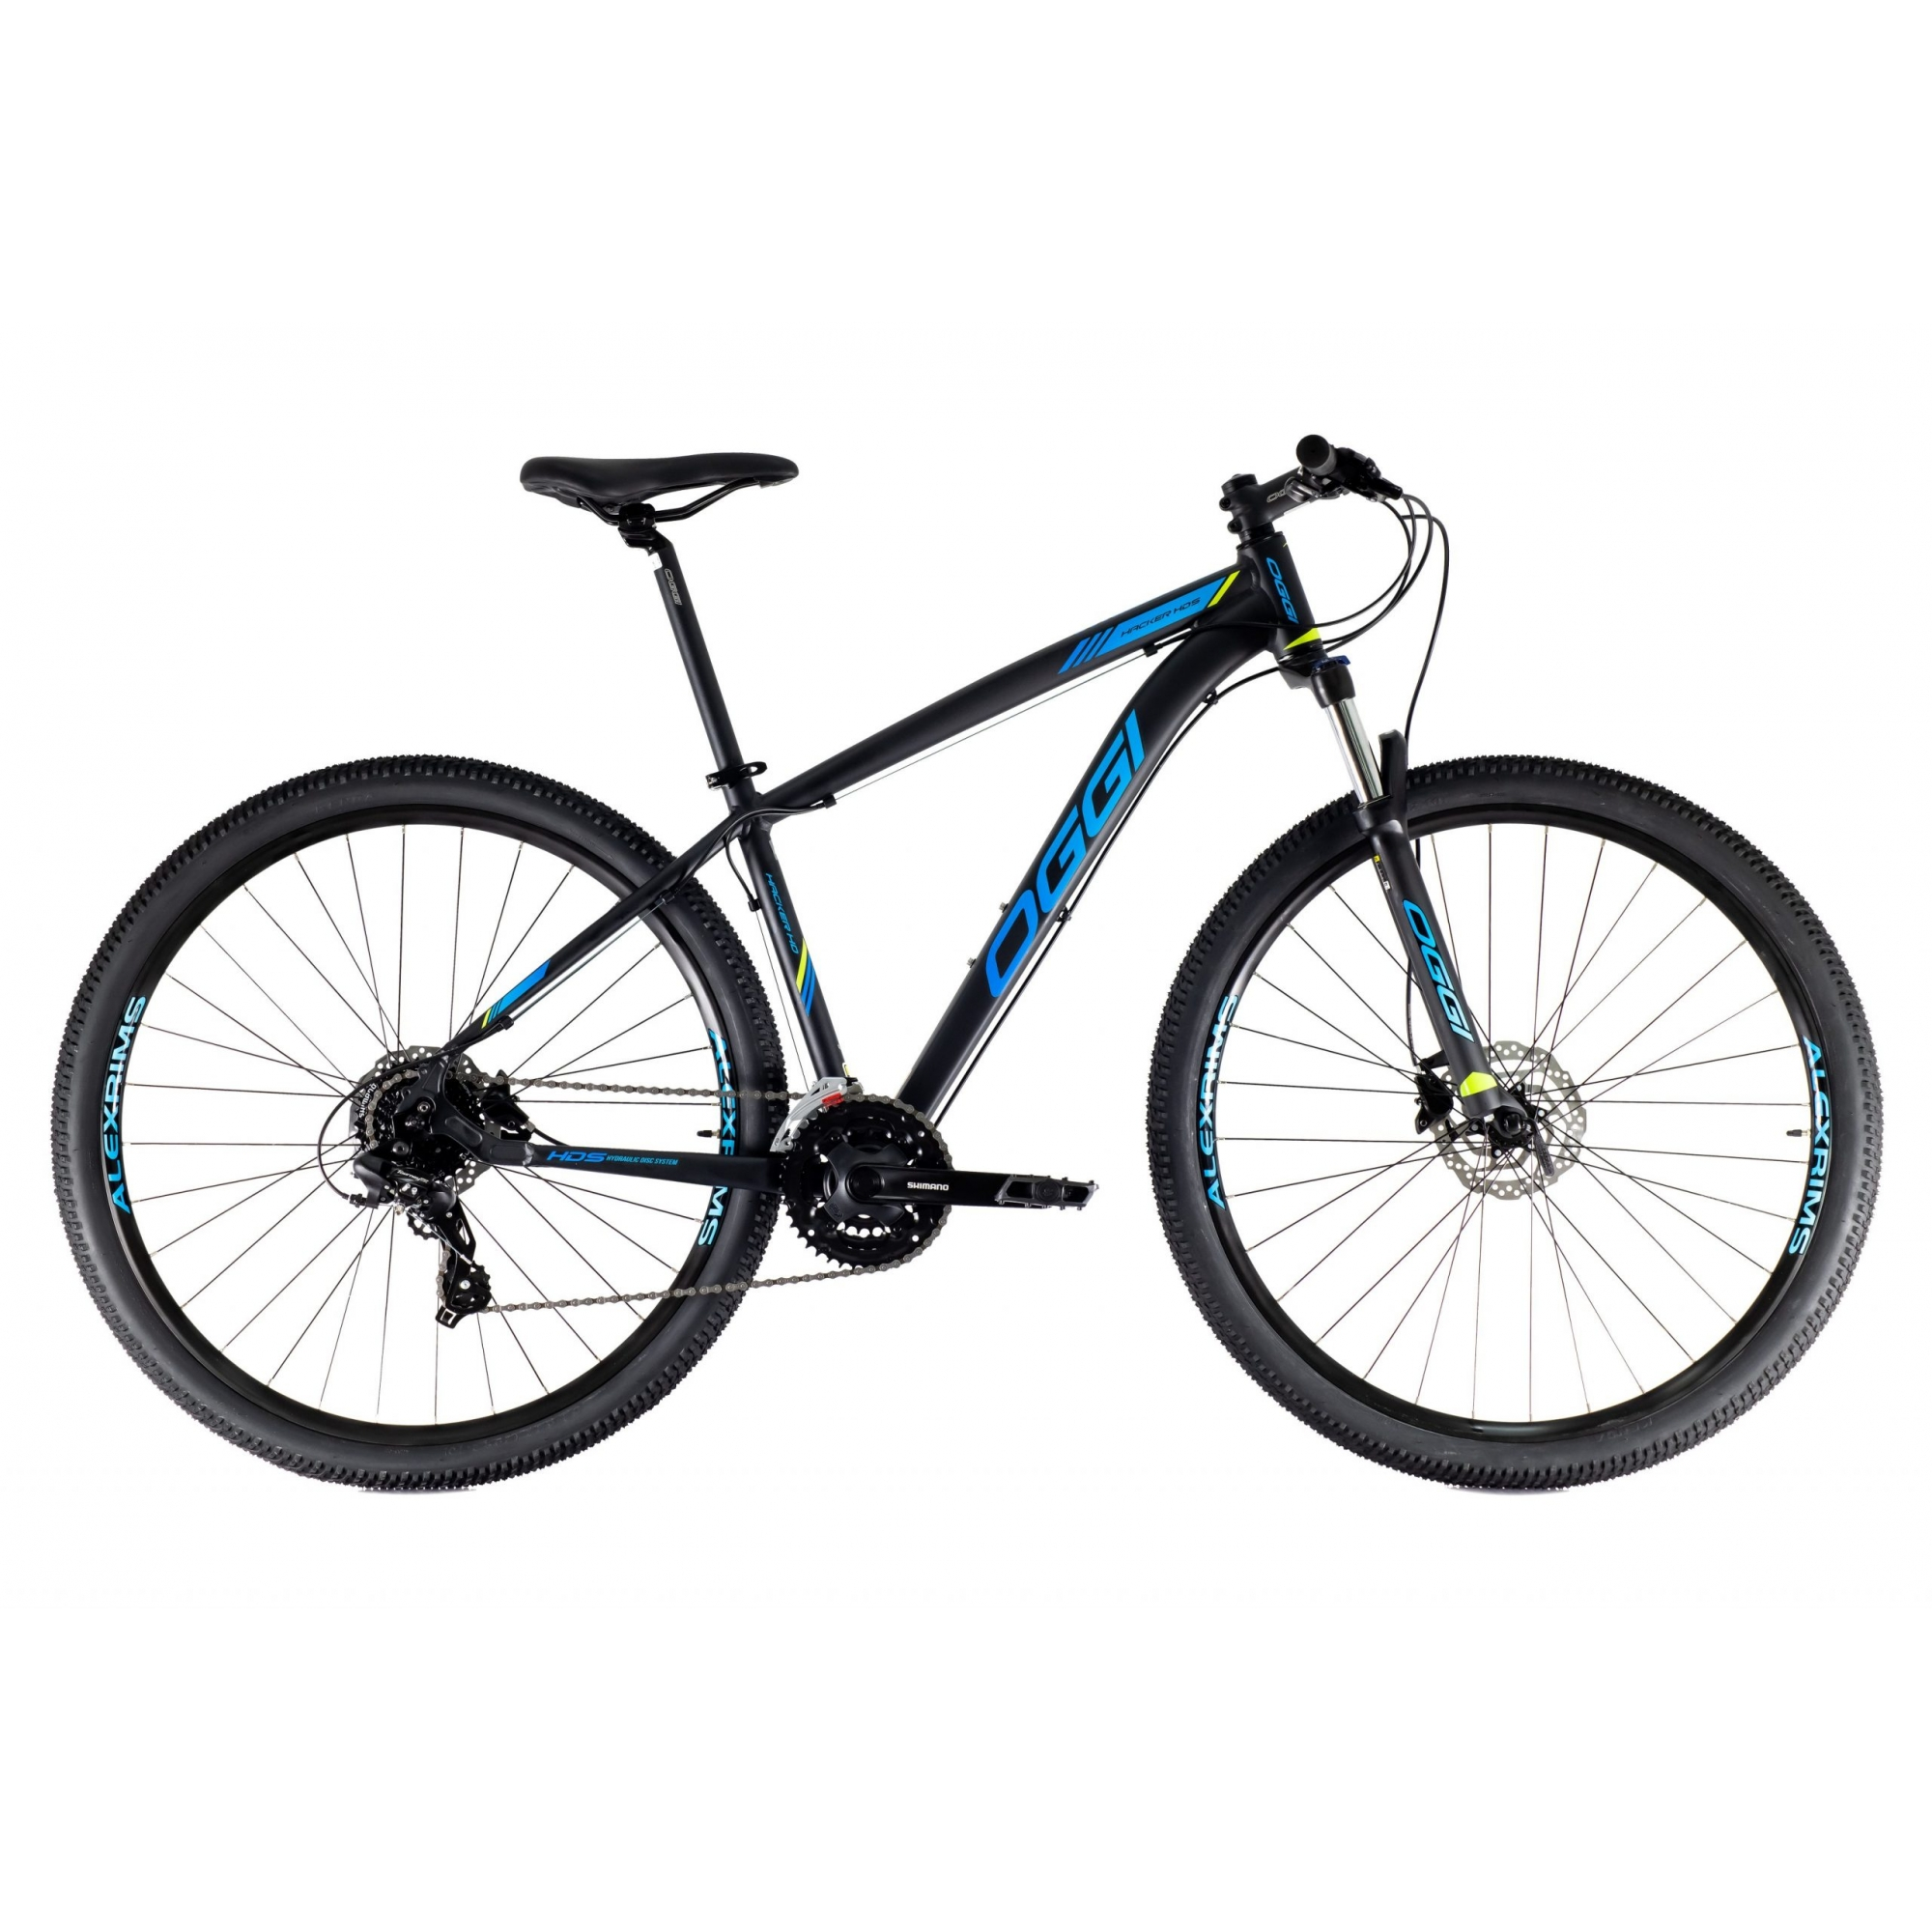 Bicicleta aro 29 Oggi Hacker HDS 24 Velocidades